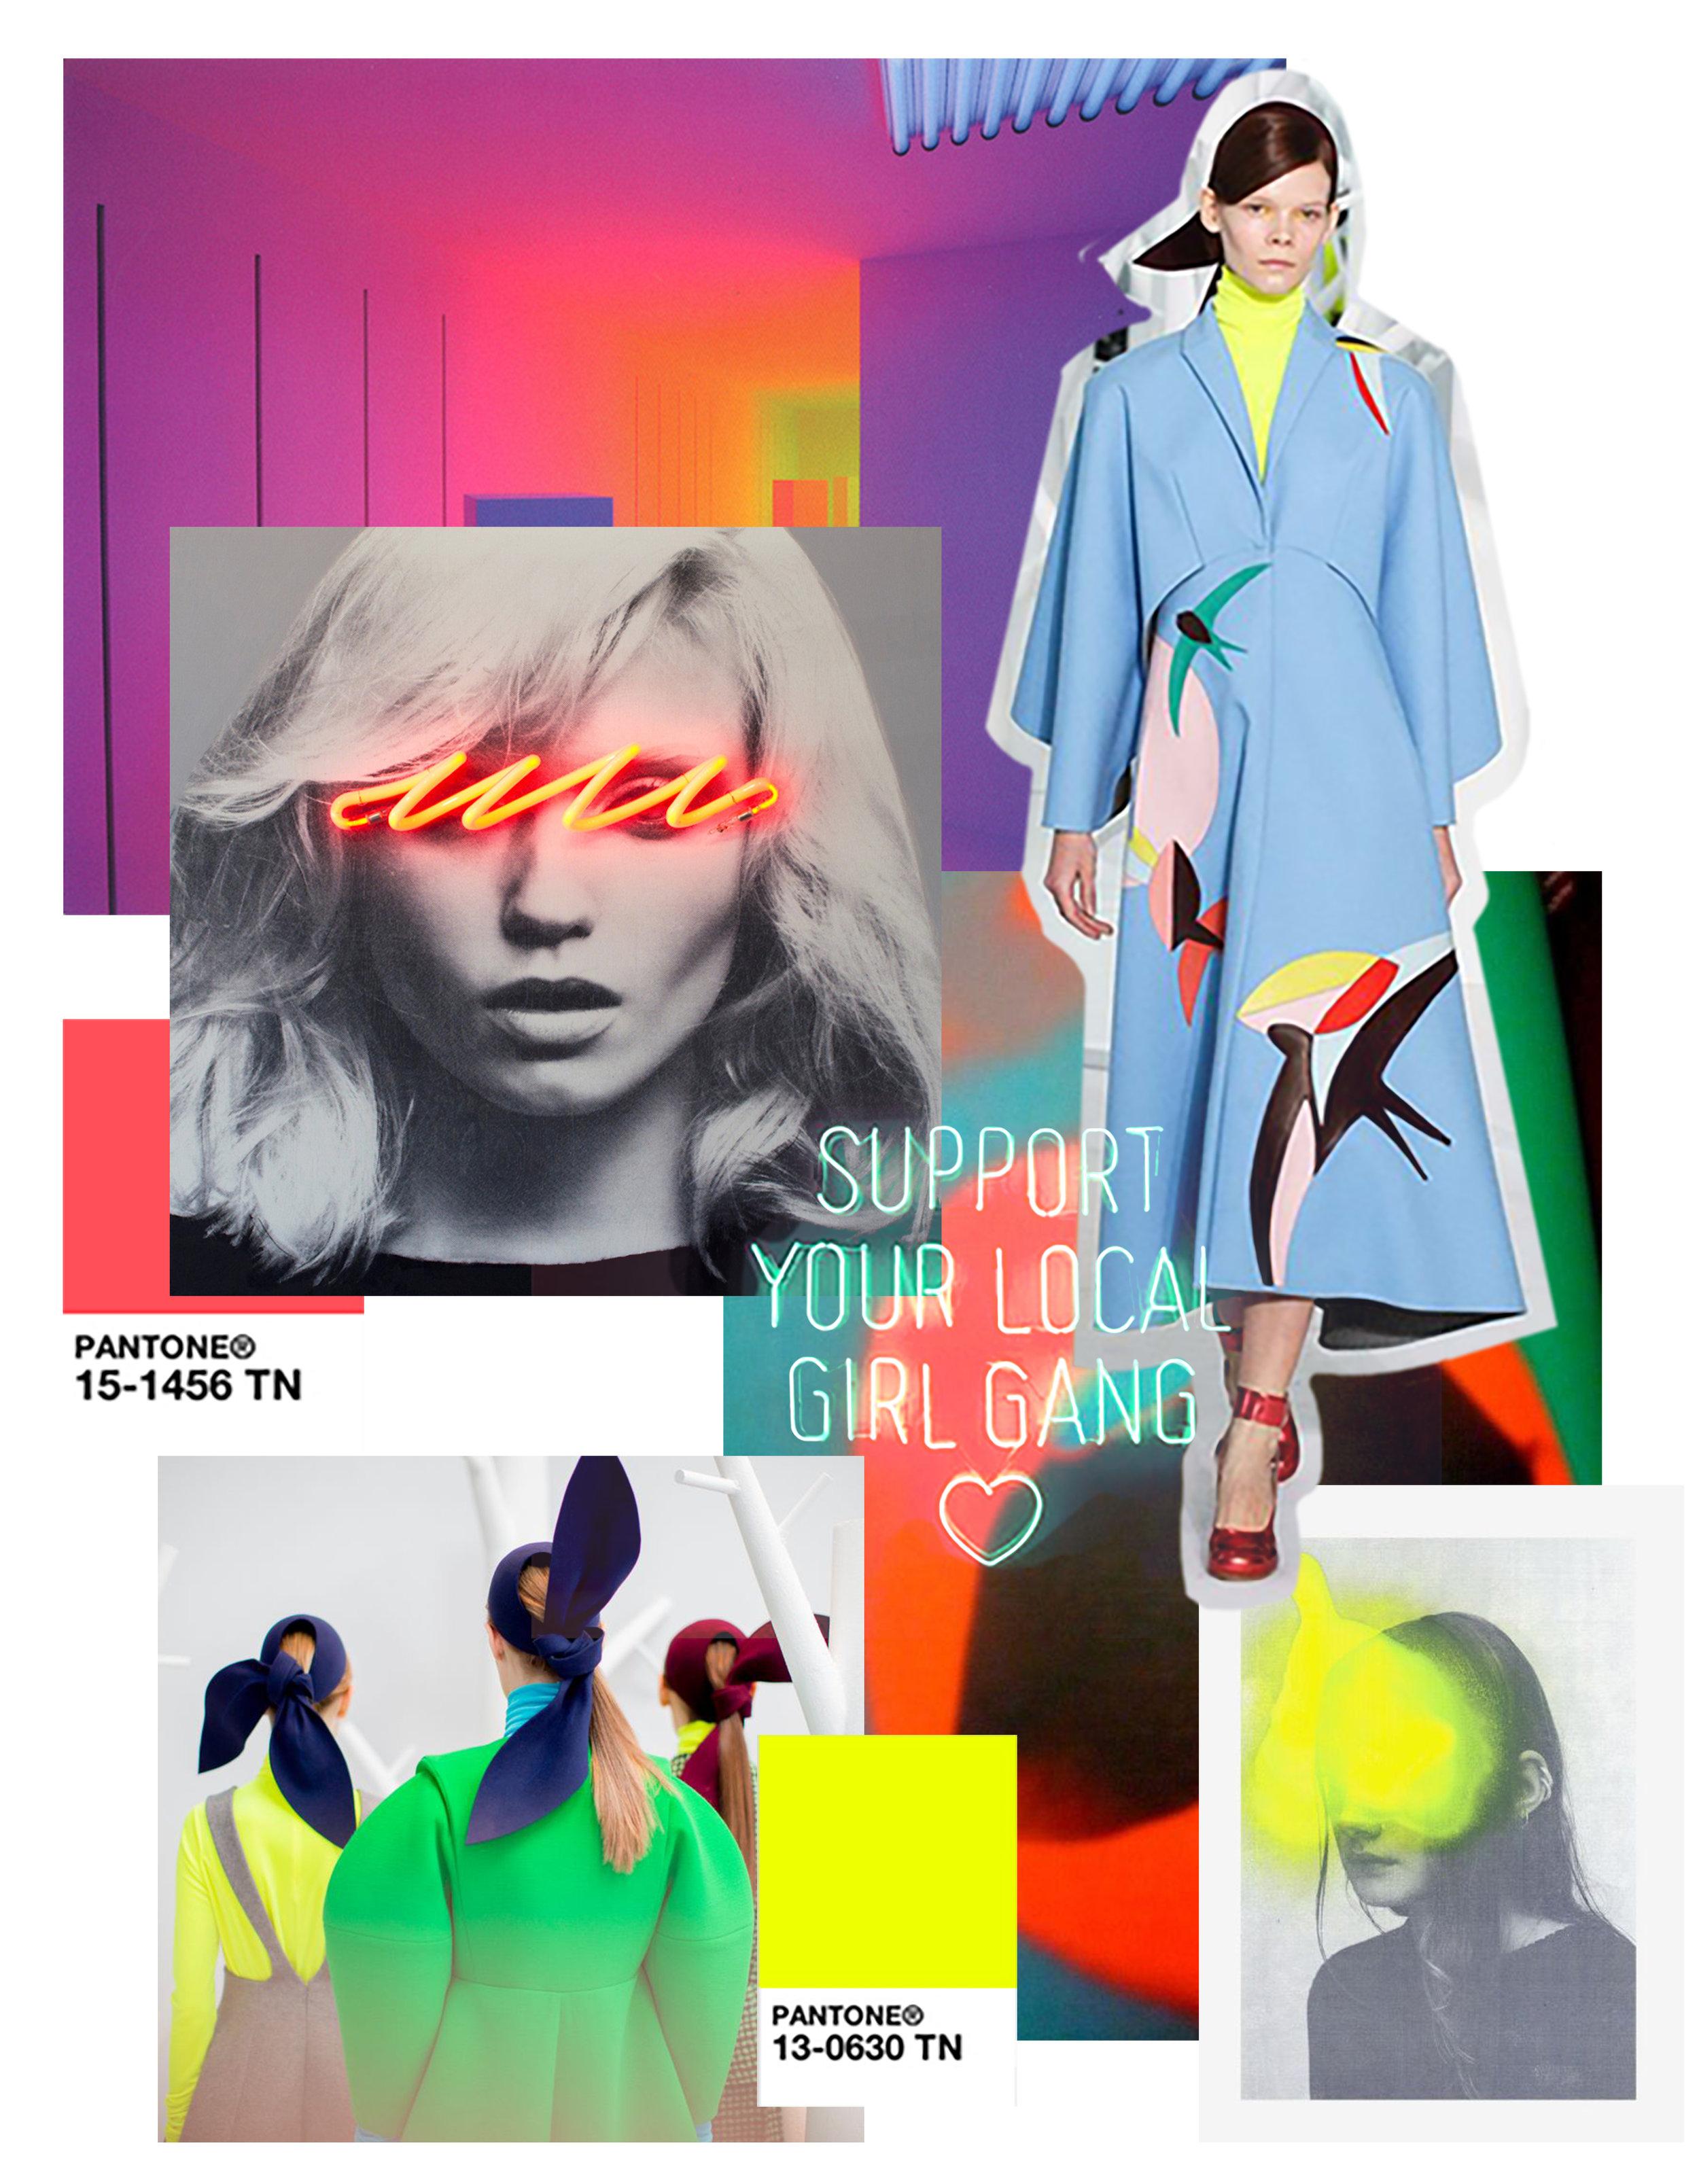 Neon room -Carlos Cruz-Diez    Text - Nick Thomm    Fashion - Delpozo Fall 15    Portrait - Javier Martin    Banner photo - Javier Martin